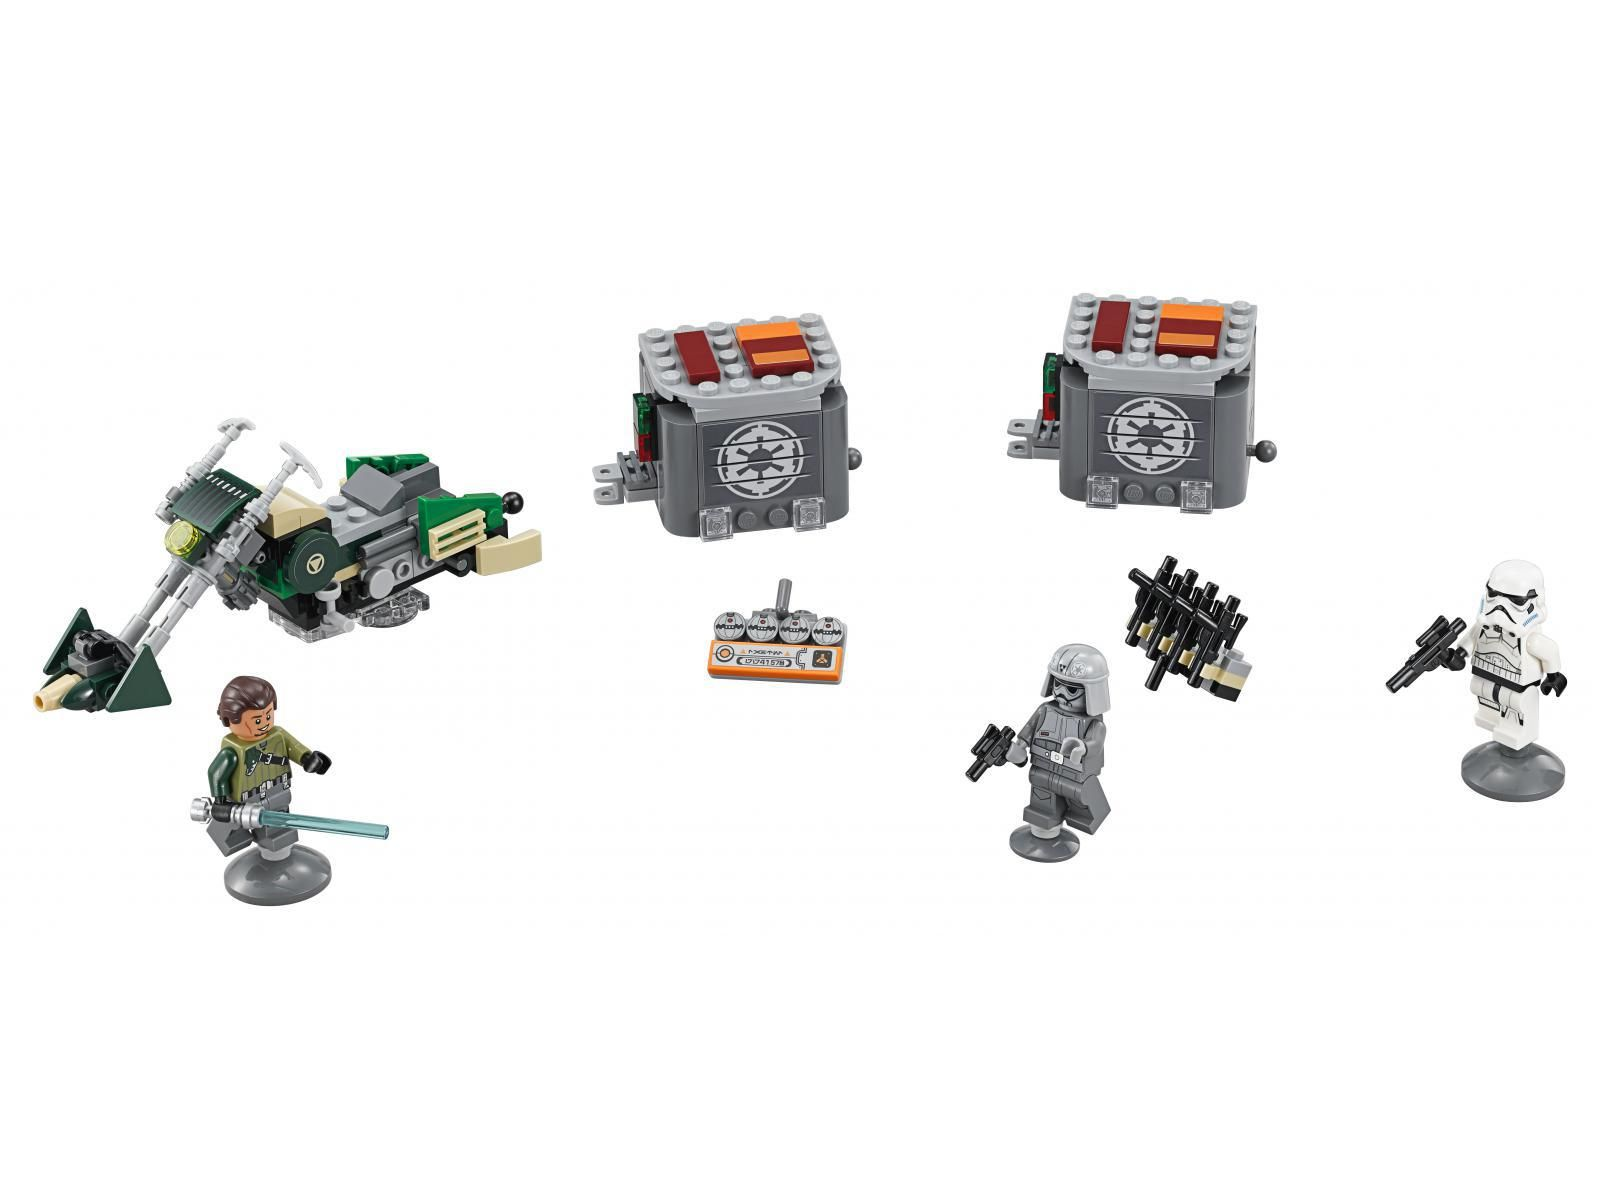 Lego 75141 star wars rebels kanans speeder bike set